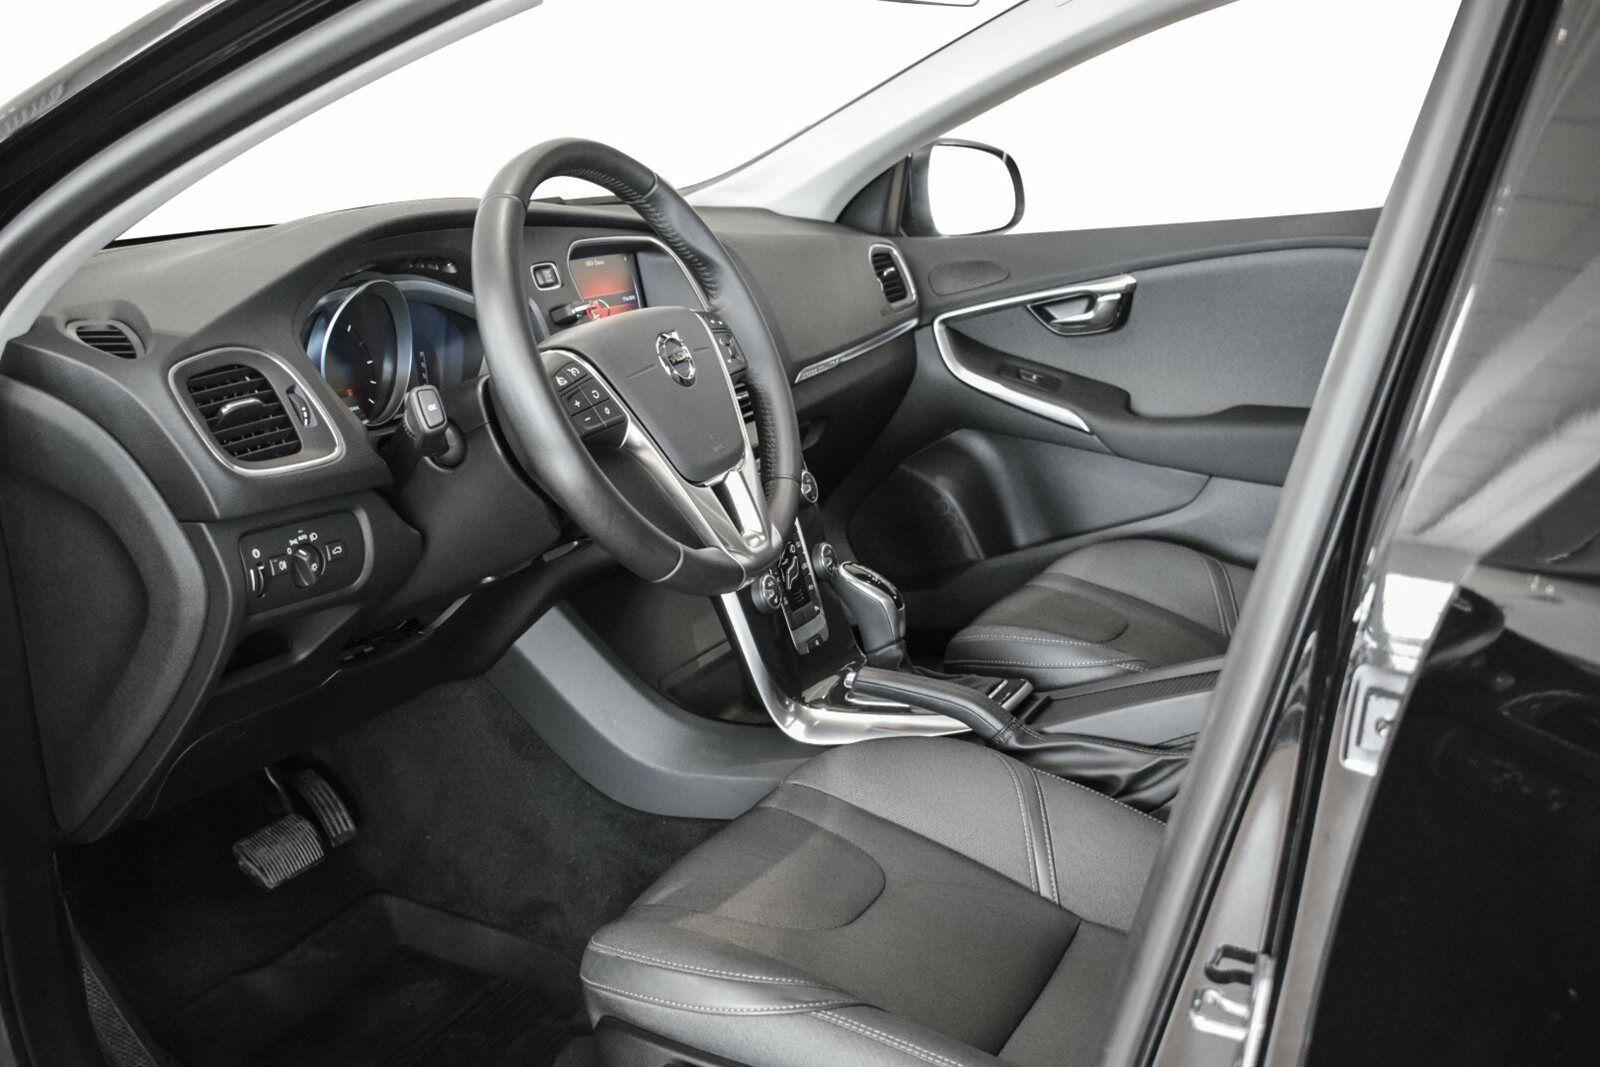 Volvo V40 CC 2,0 D3 150 Momentum aut. - billede 8